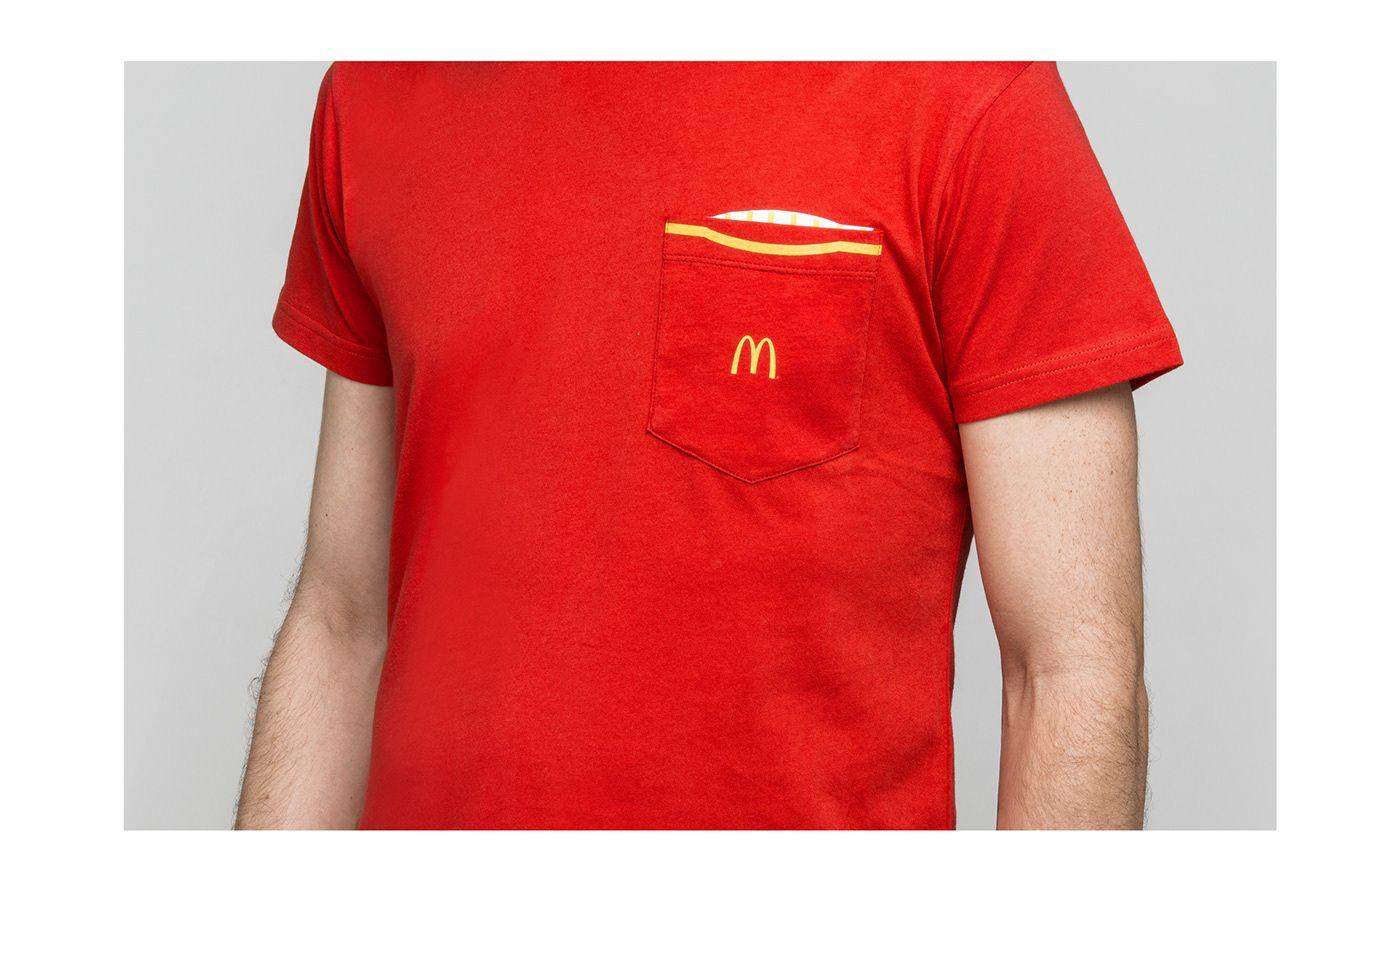 McDonald's Vietnam on Behance Professional uniforms